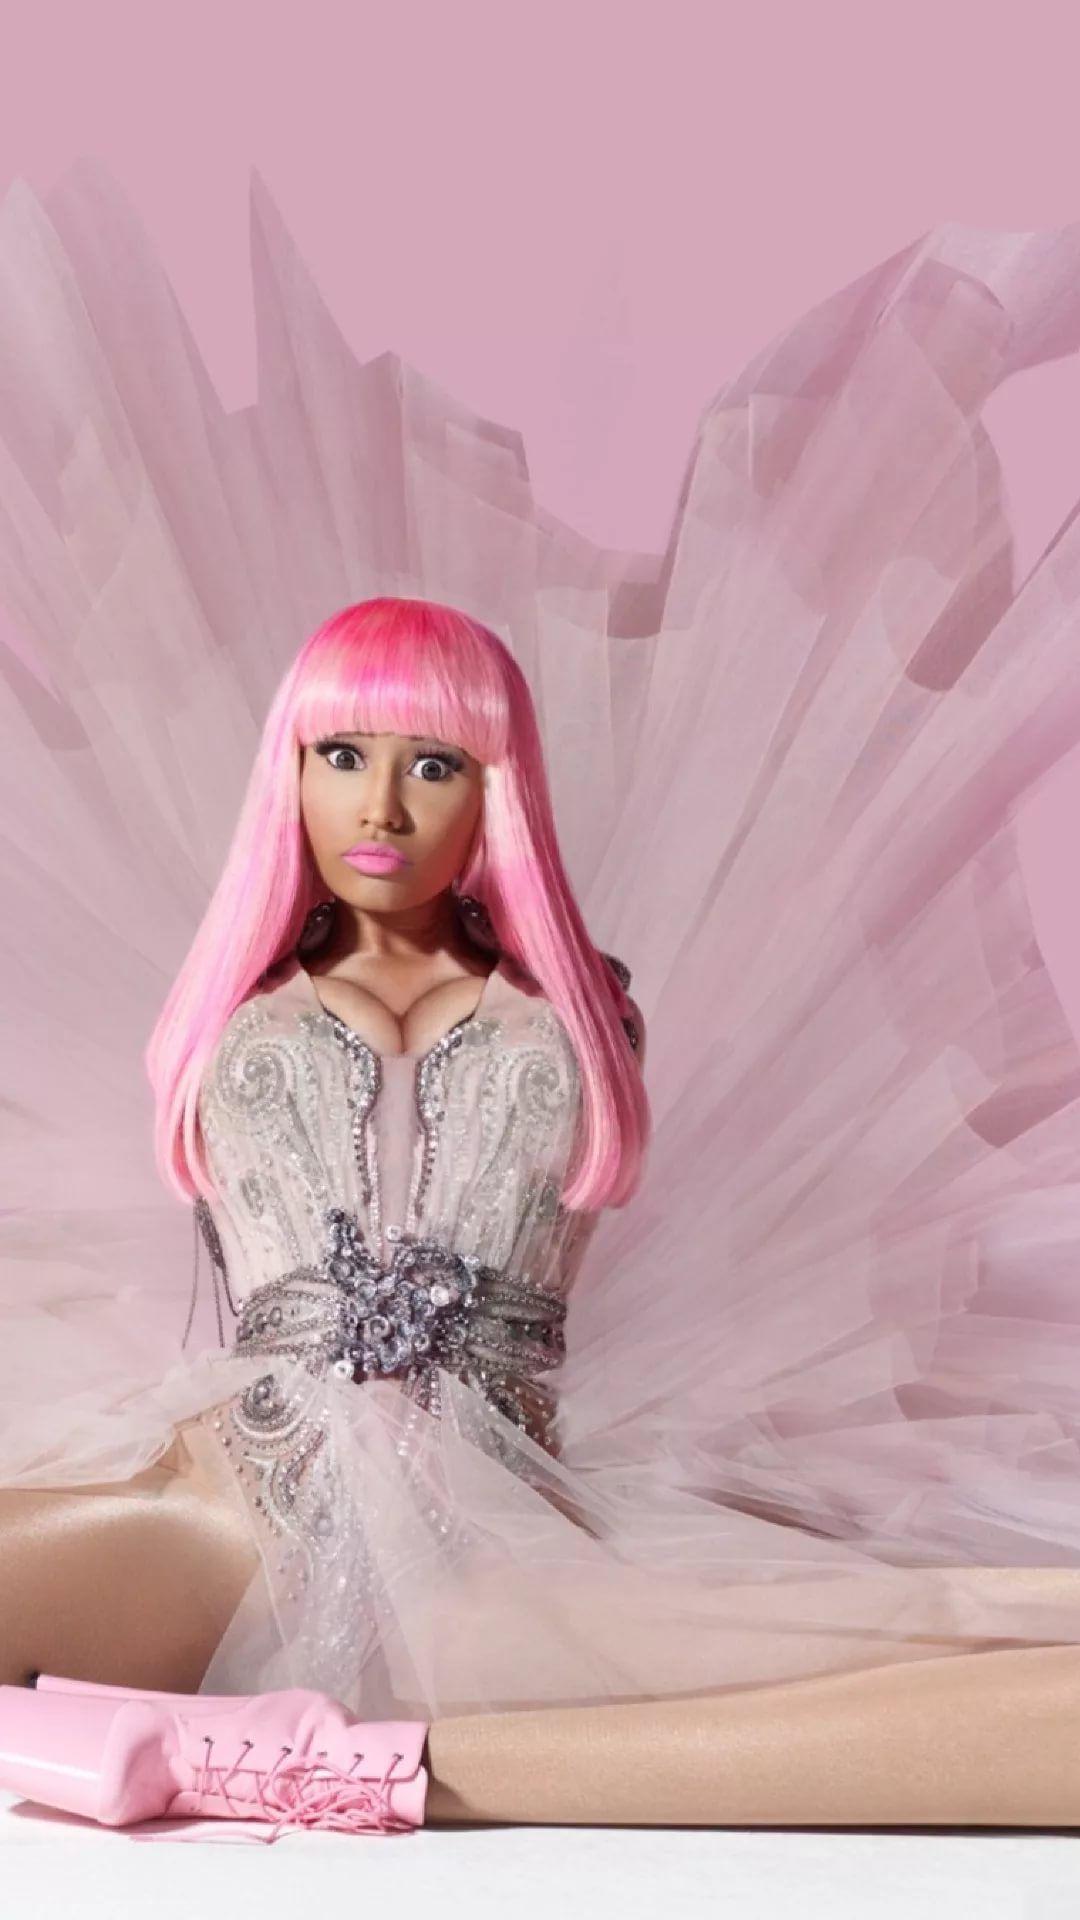 Nicki Minaj Anaconda phone wallpaper